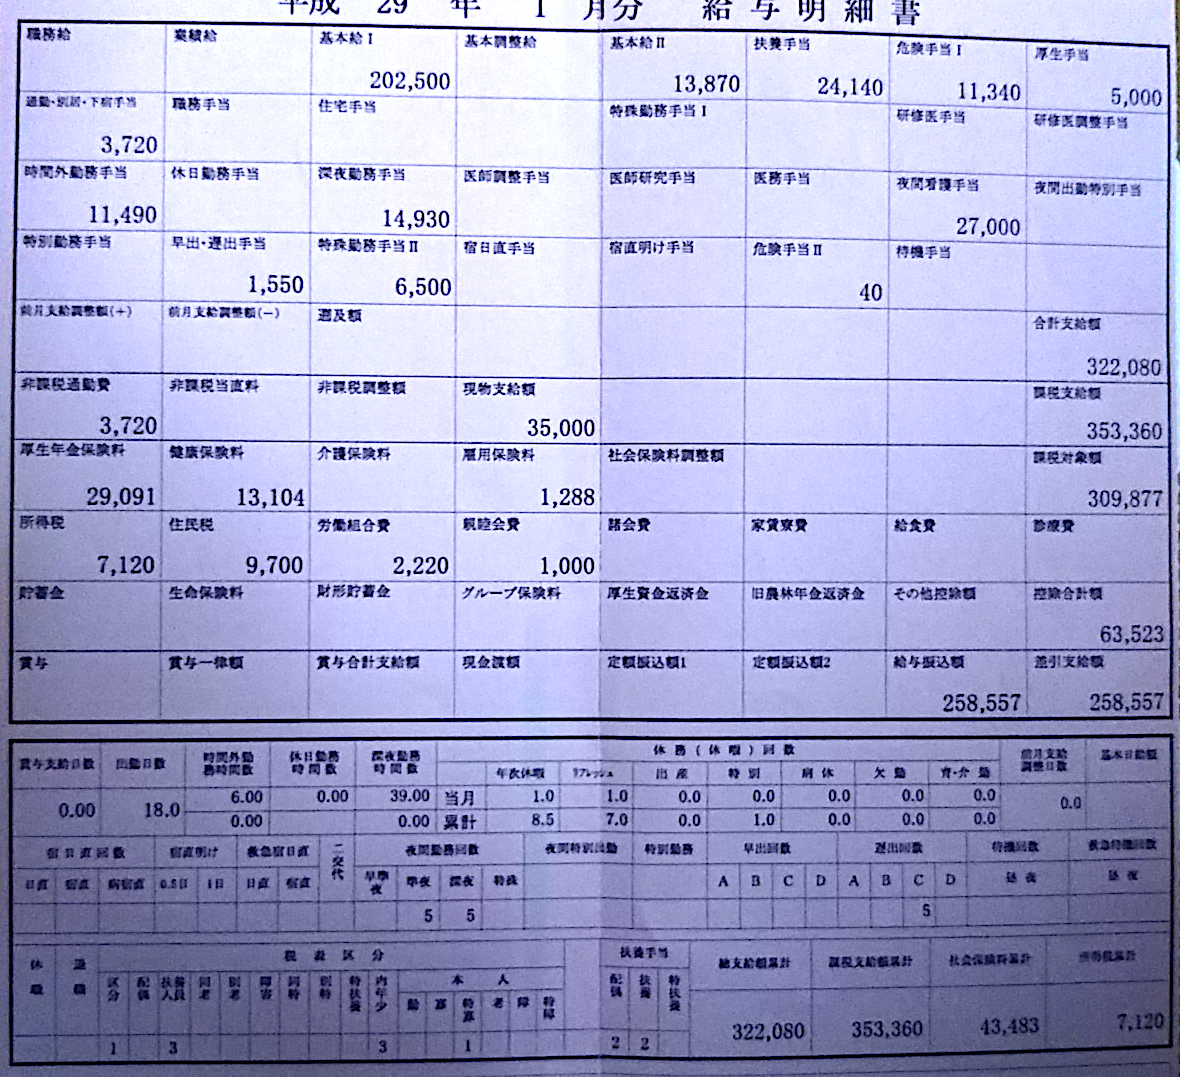 【実際の画像】鈴鹿中央総合病院・看護師の給与明細・評判・給料・ボーナス・年収